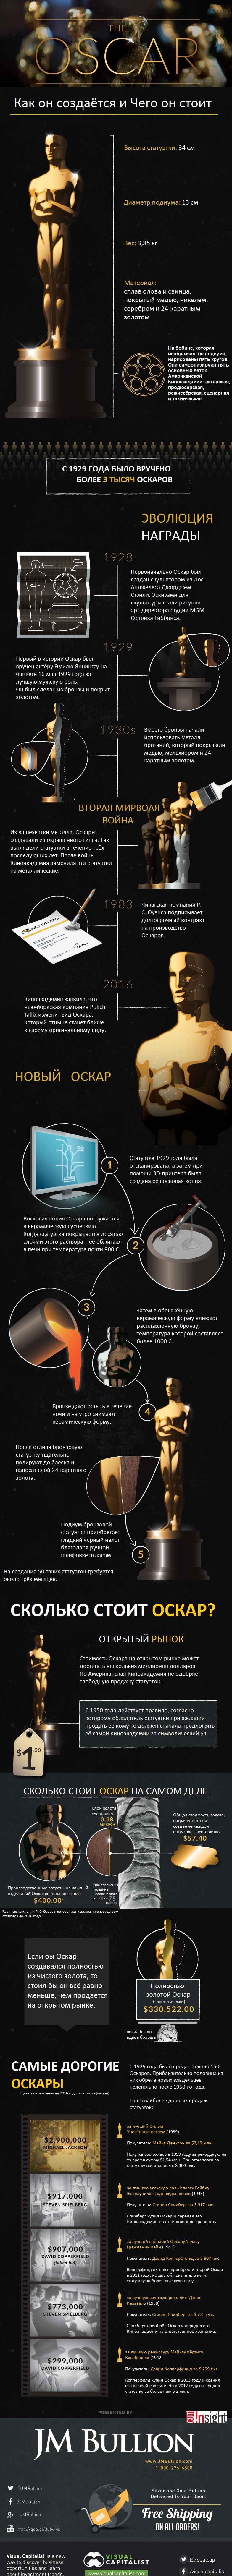 Инфографика  Инфографика: Сколько стоит Оскар?